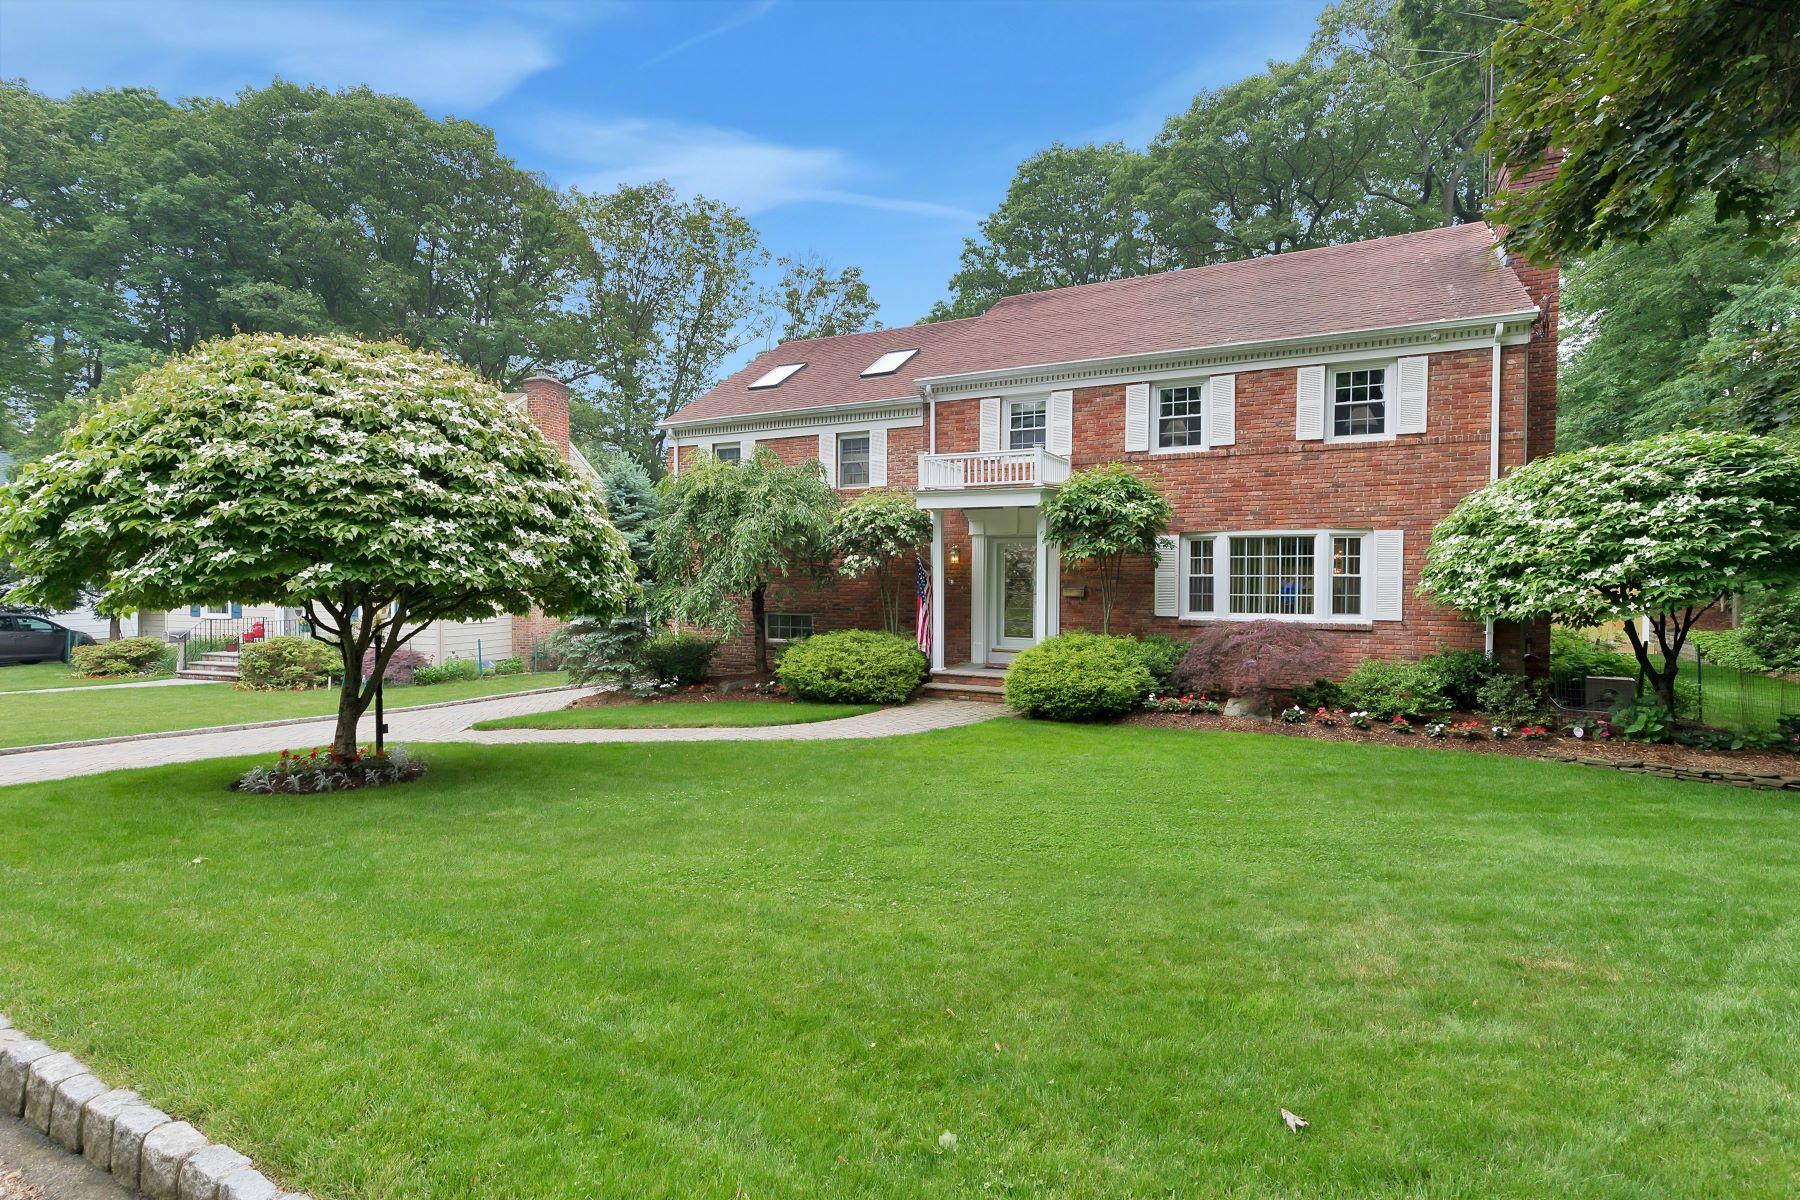 Casa Unifamiliar por un Venta en Spectacular Residence 296 Partridge Run Mountainside, Nueva Jersey 07092 Estados Unidos